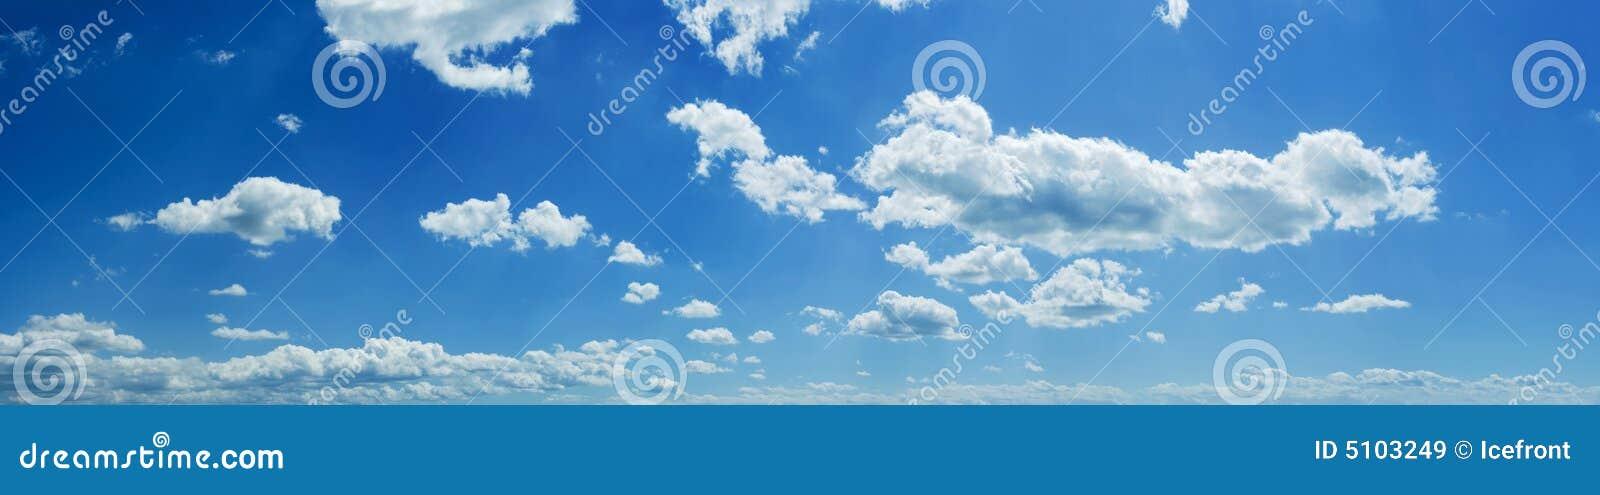 Panorama de ciel